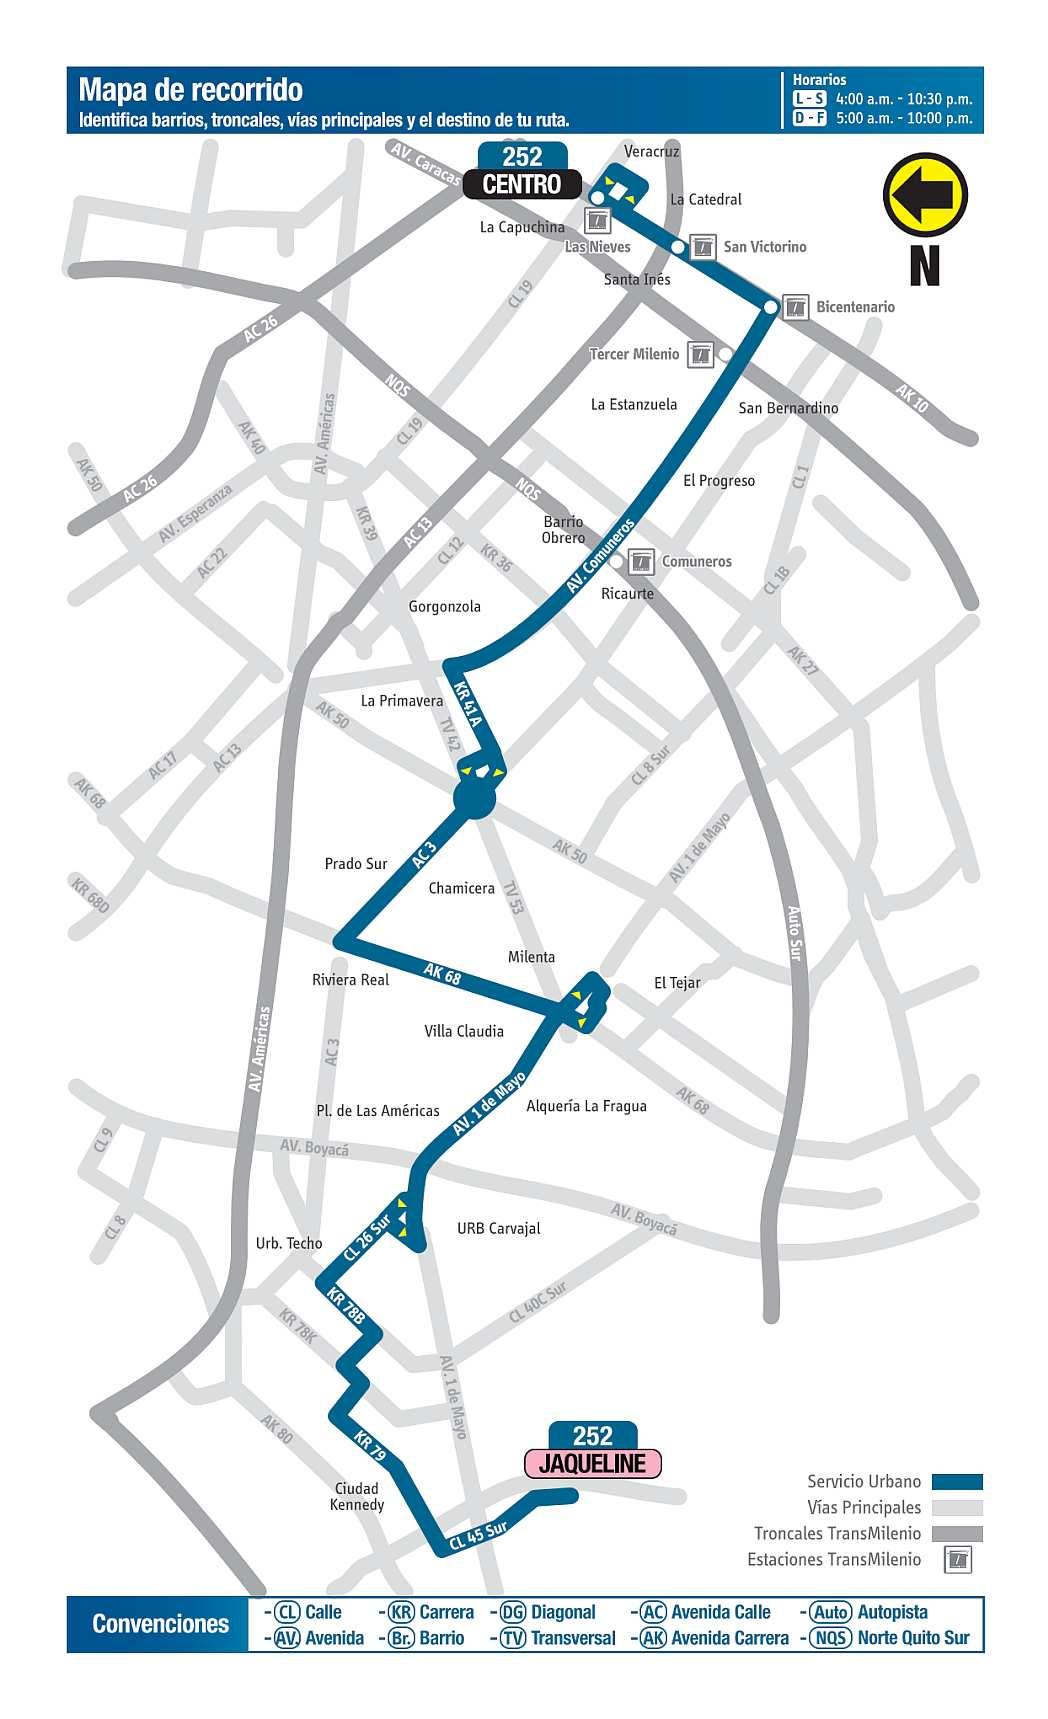 252 Jaqueline - Centro, mapa bus urbano Bogotá